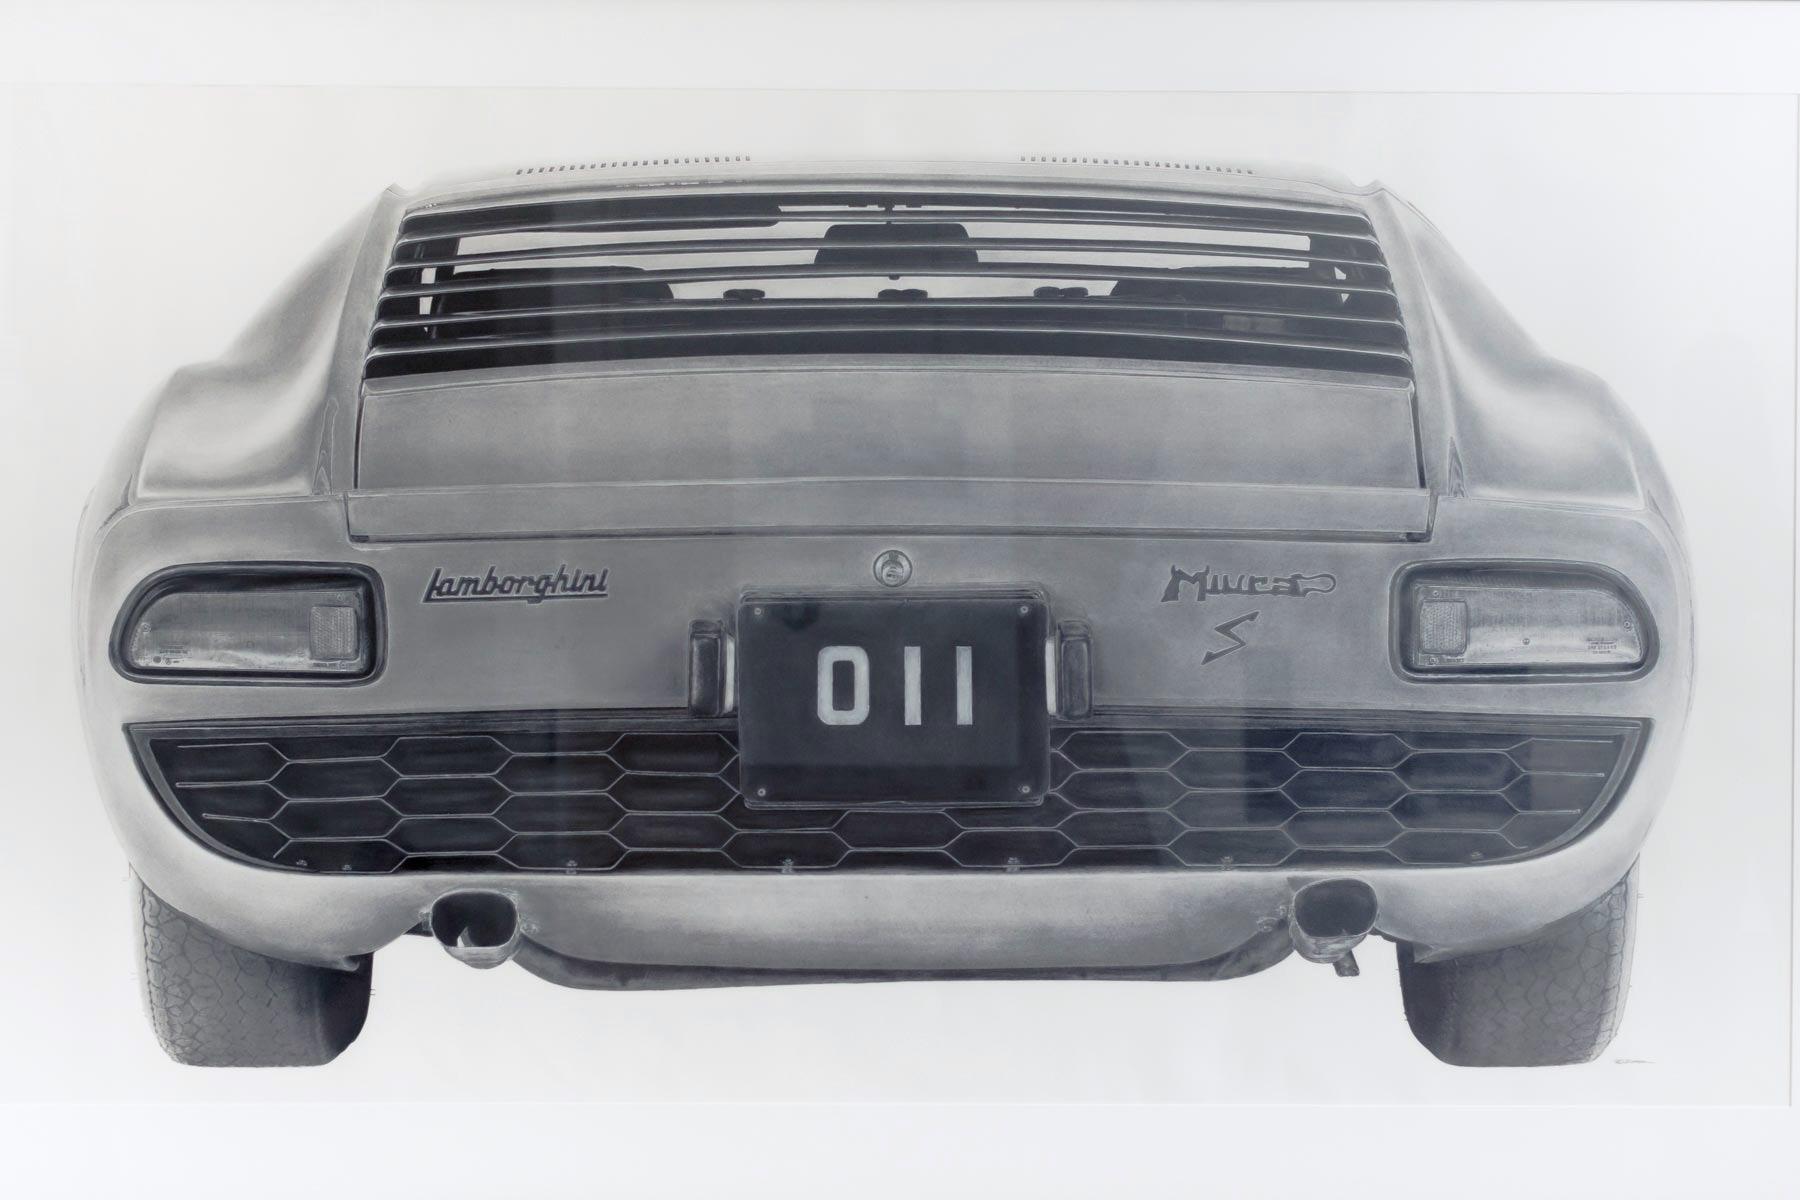 Lifesize Lamborghini Miura S info + enquiries